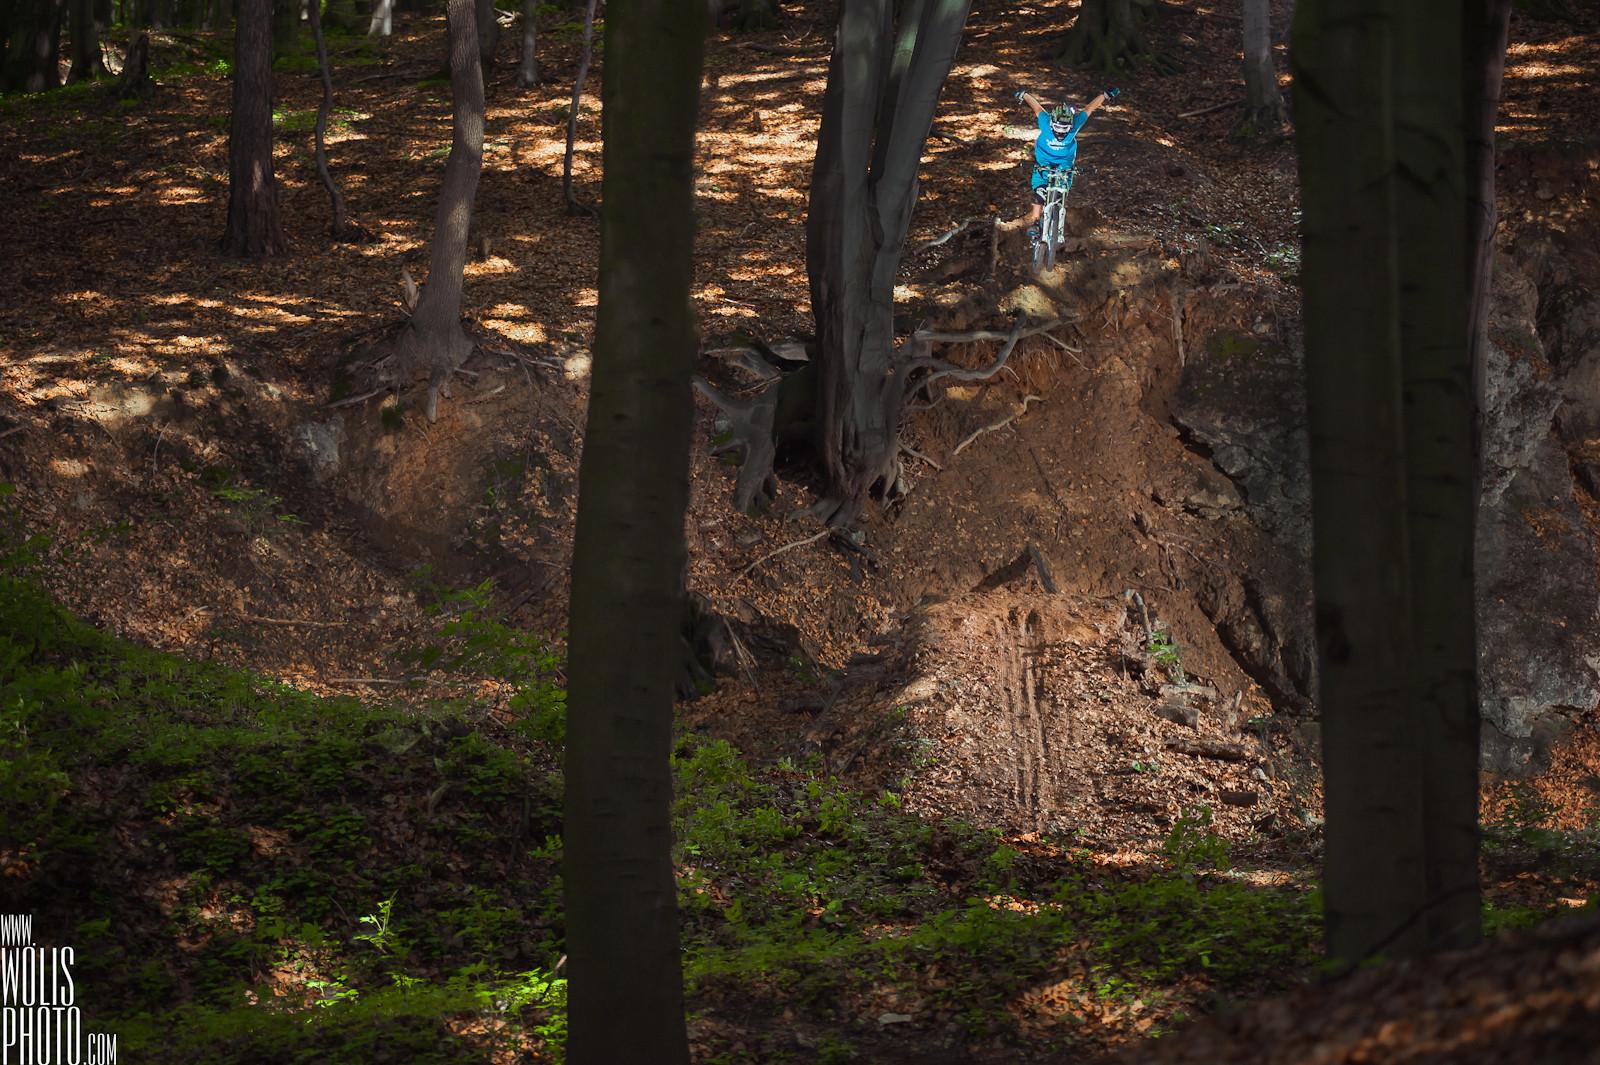 Gap - JawsMtb - Mountain Biking Pictures - Vital MTB